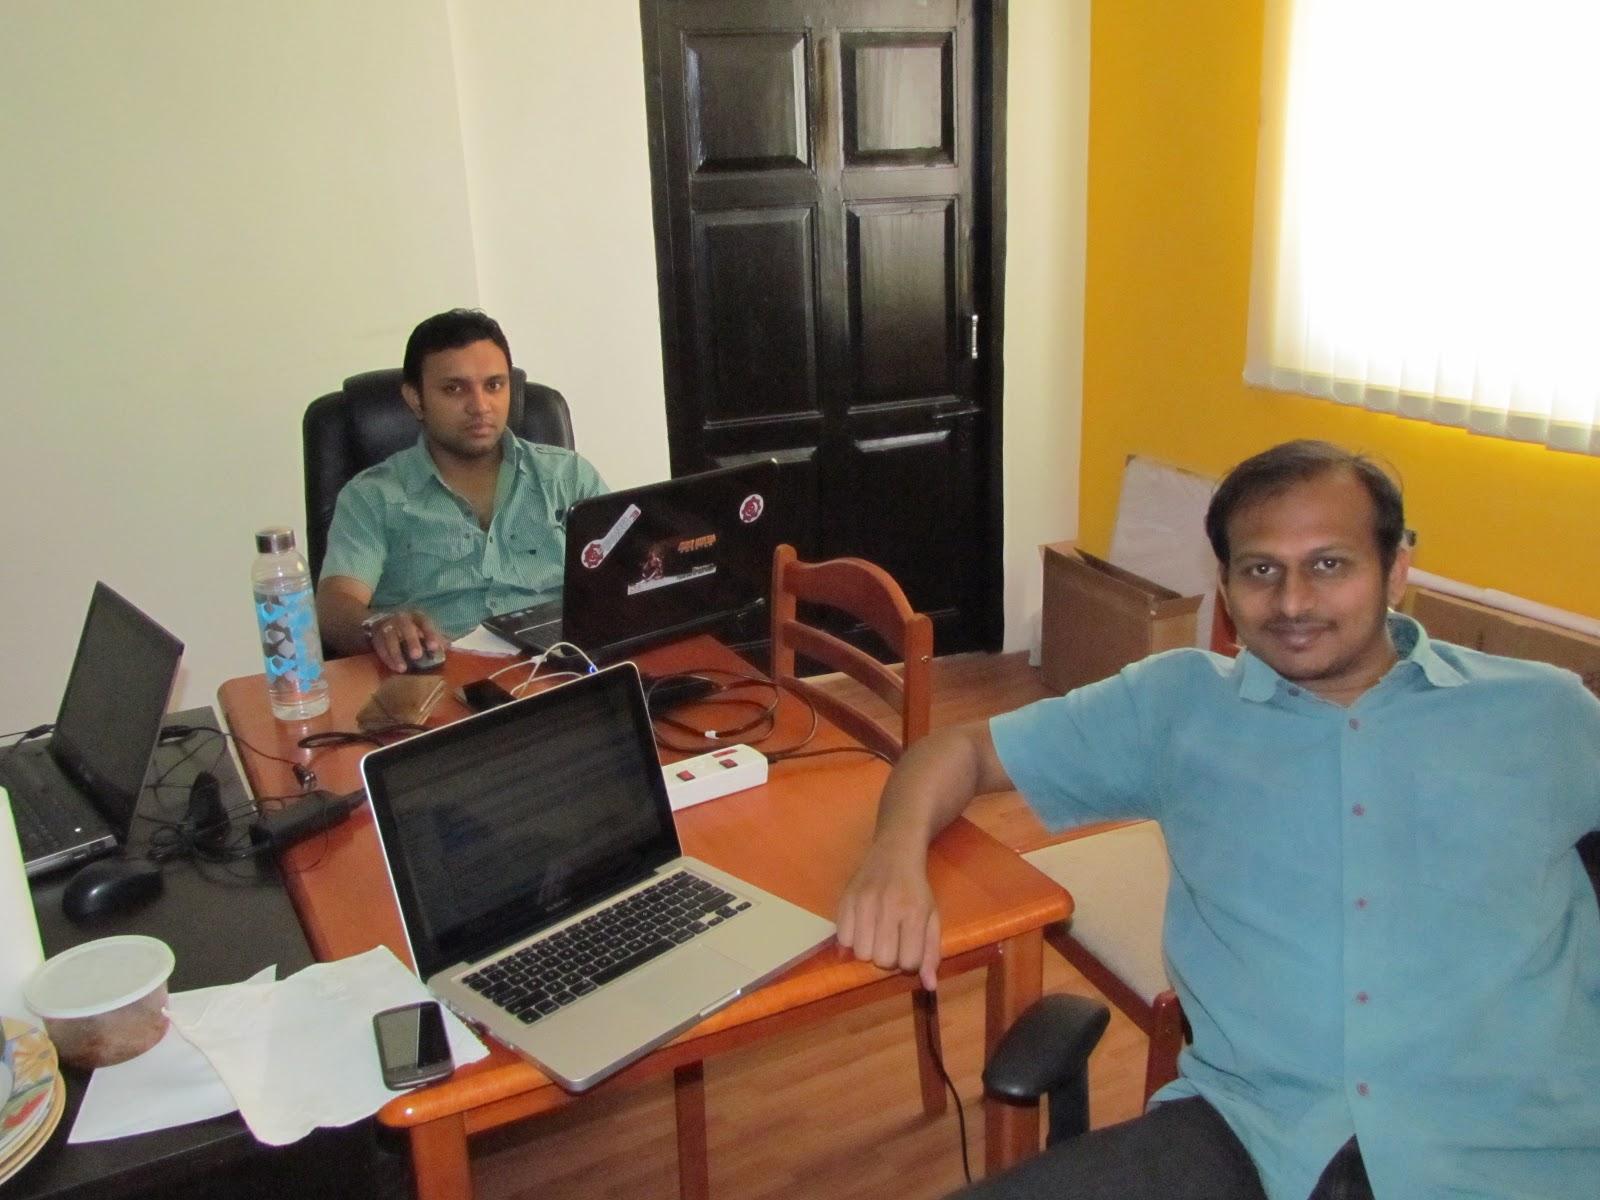 Meet Freshworks Founders: Girish Mathrubootham, Shan Krishnasamy